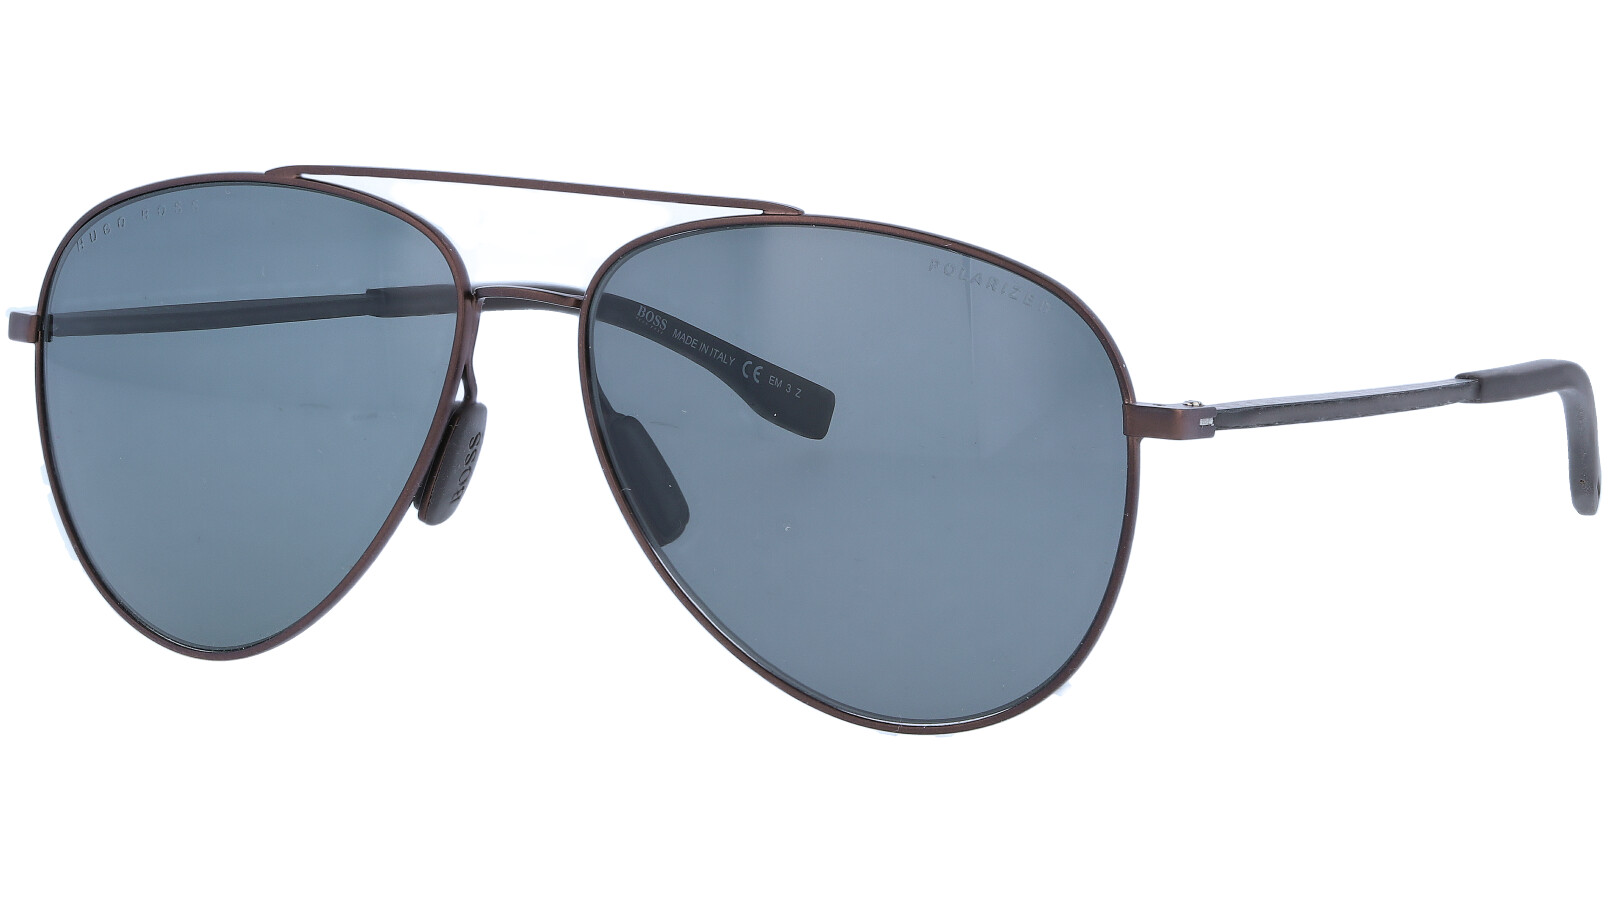 Hugo Boss BOSS0938S 2P4M9 59 Brown Sunglasses